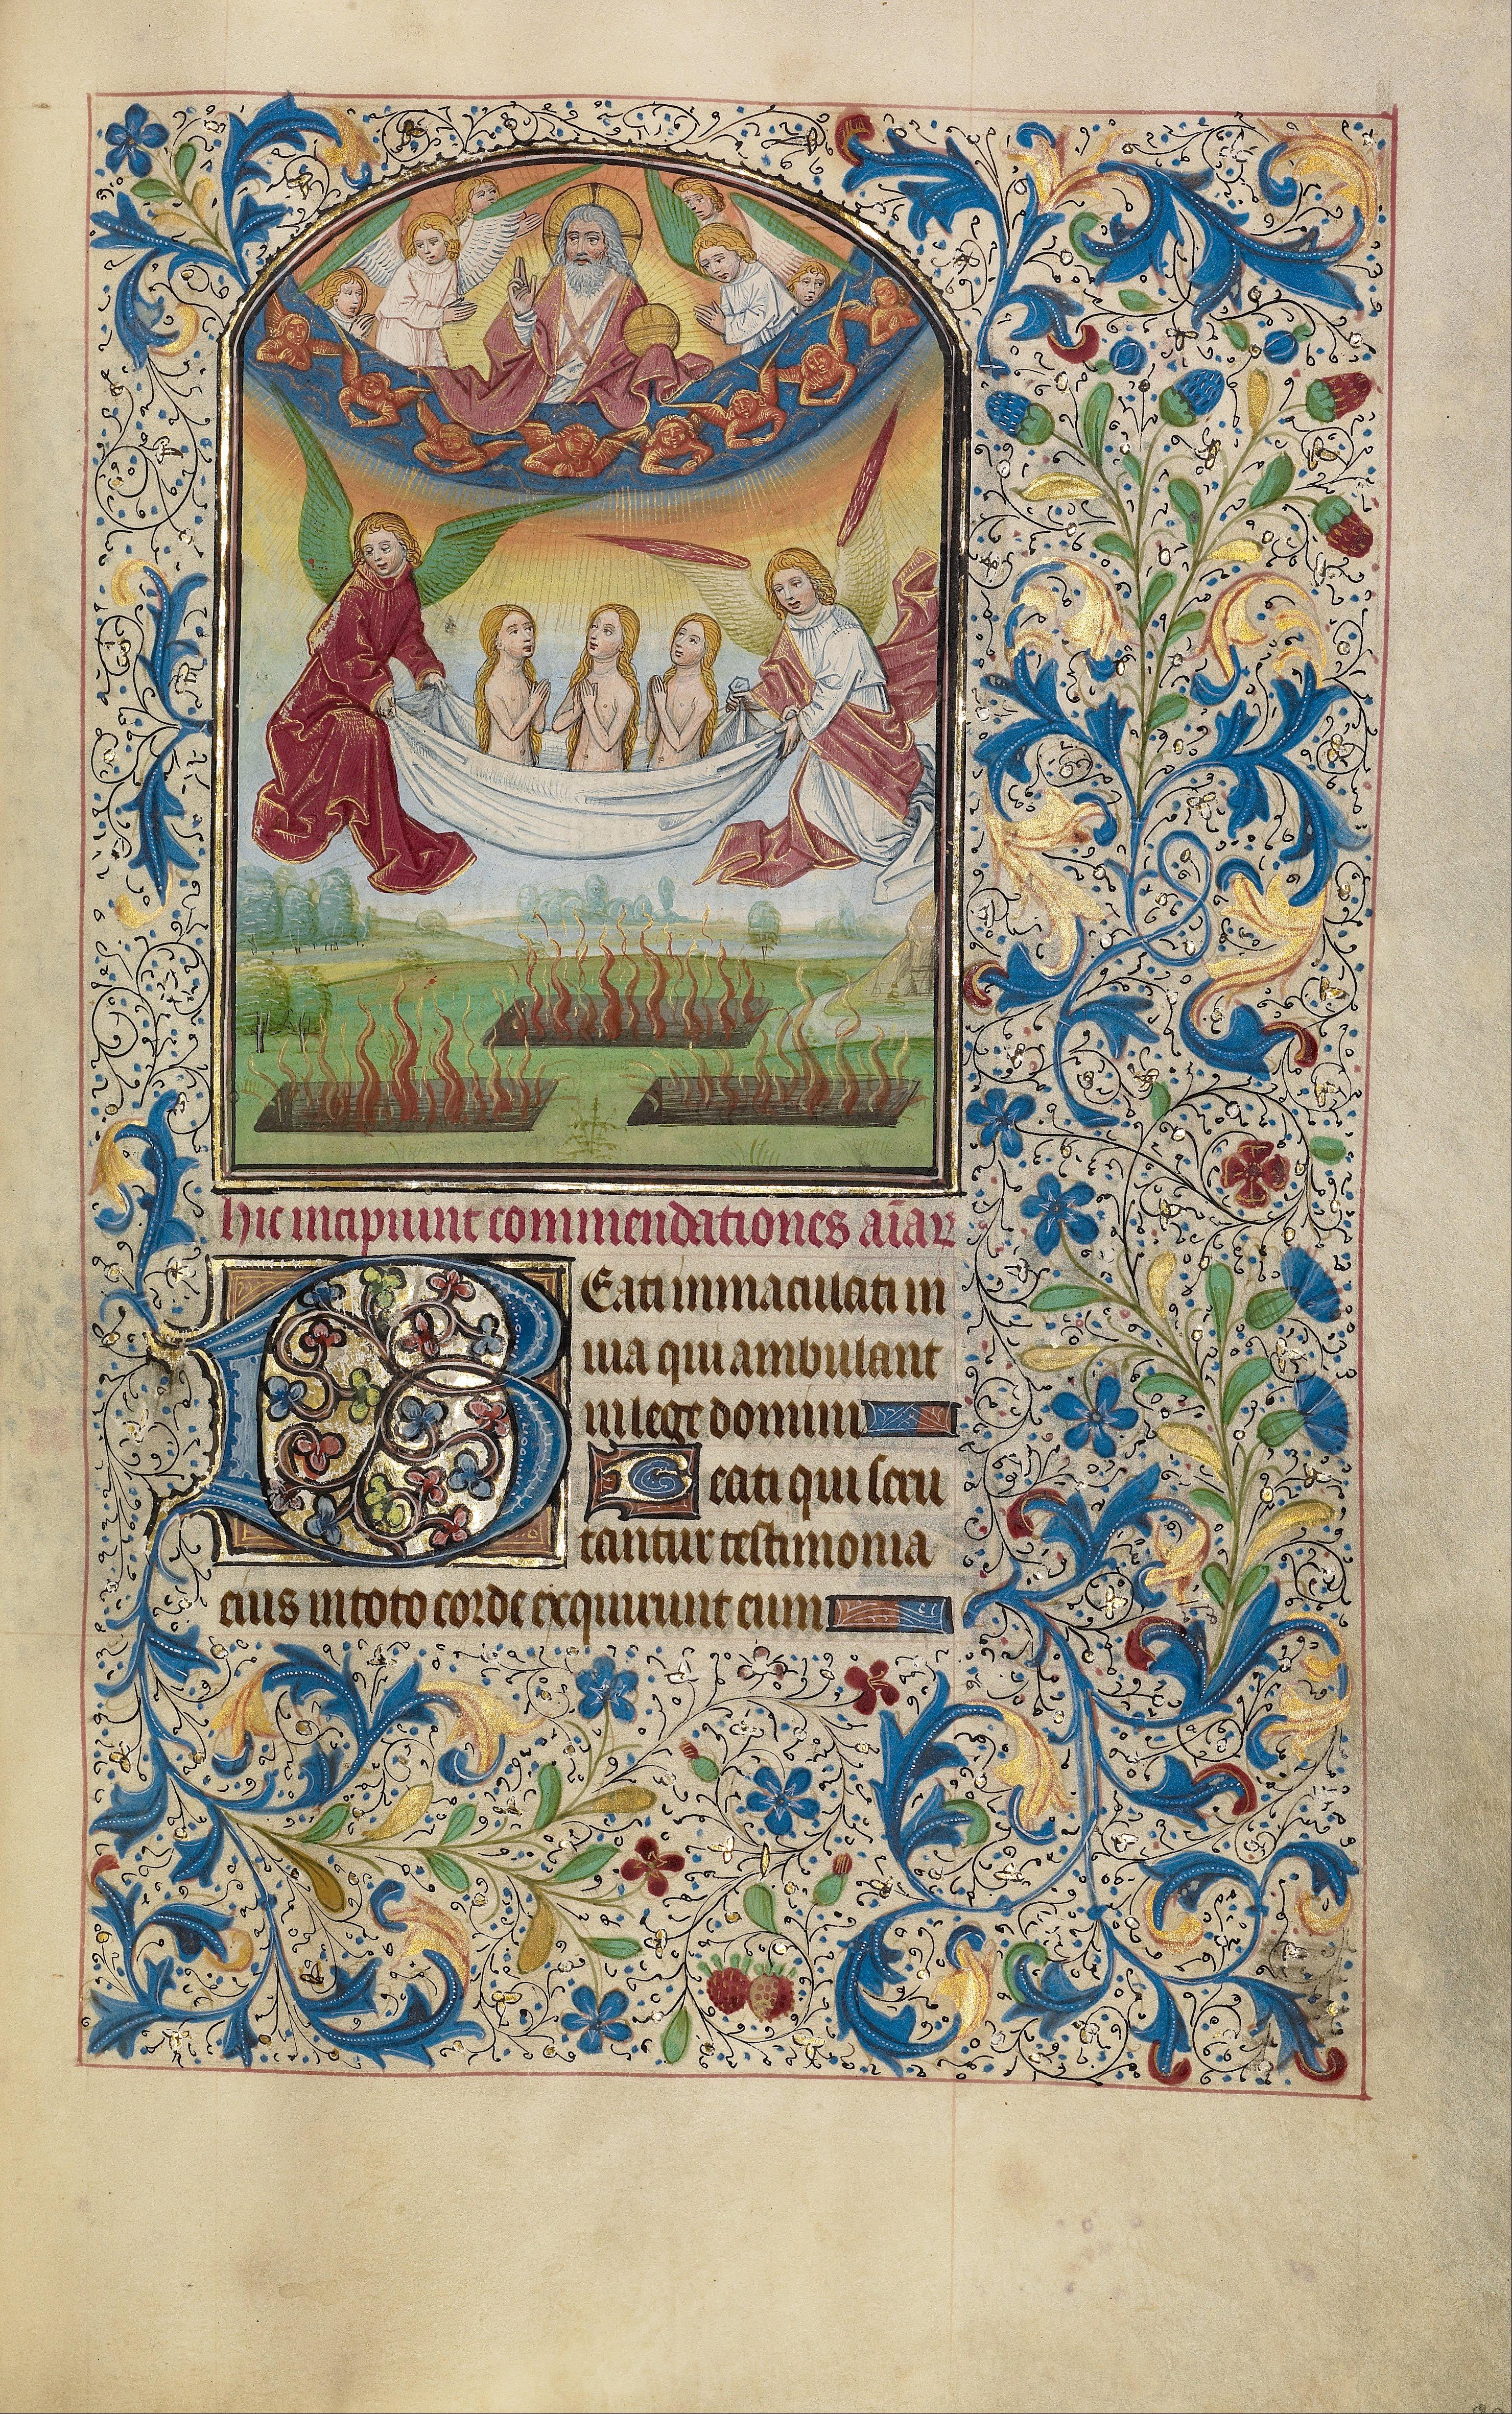 File:Willem Vrelant (Flemish, died 1481, active 1454 - 1481) -